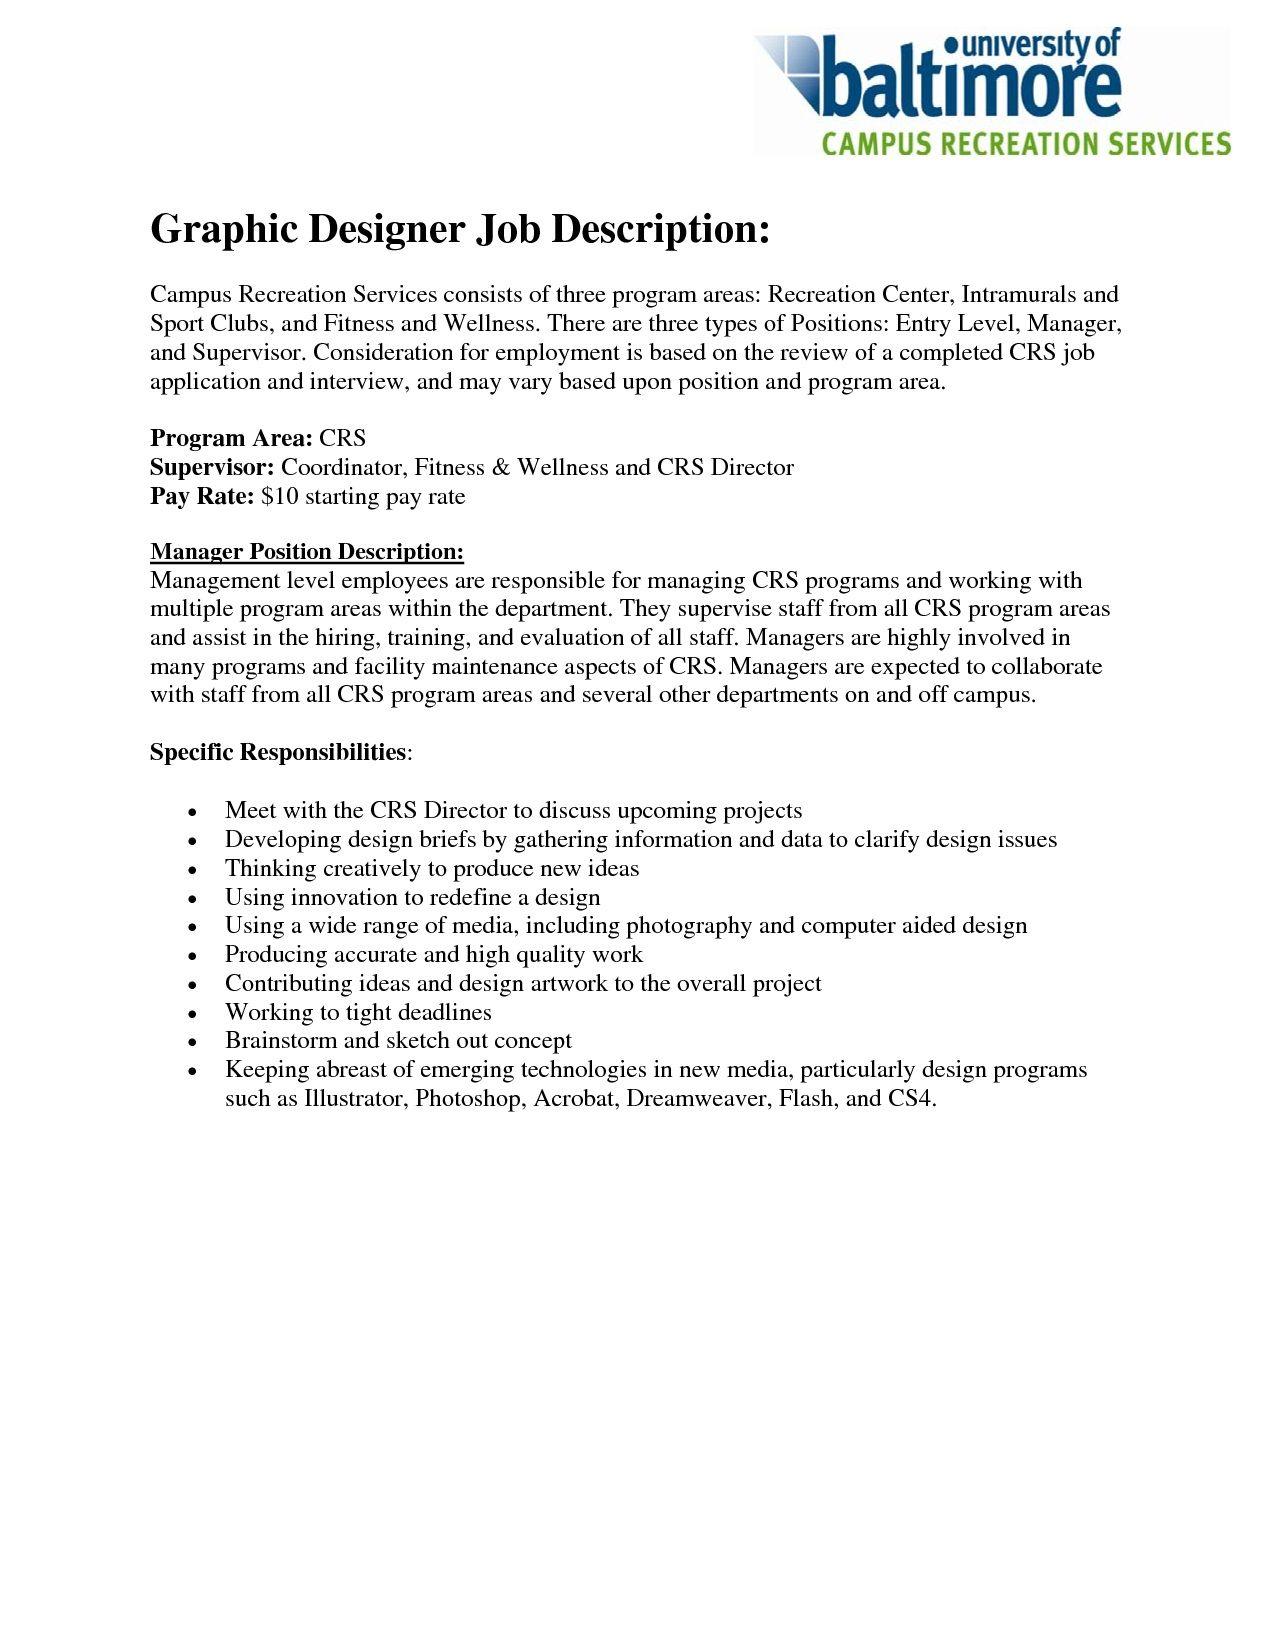 Graphic Designer Job Description Resume Free Resume Templates